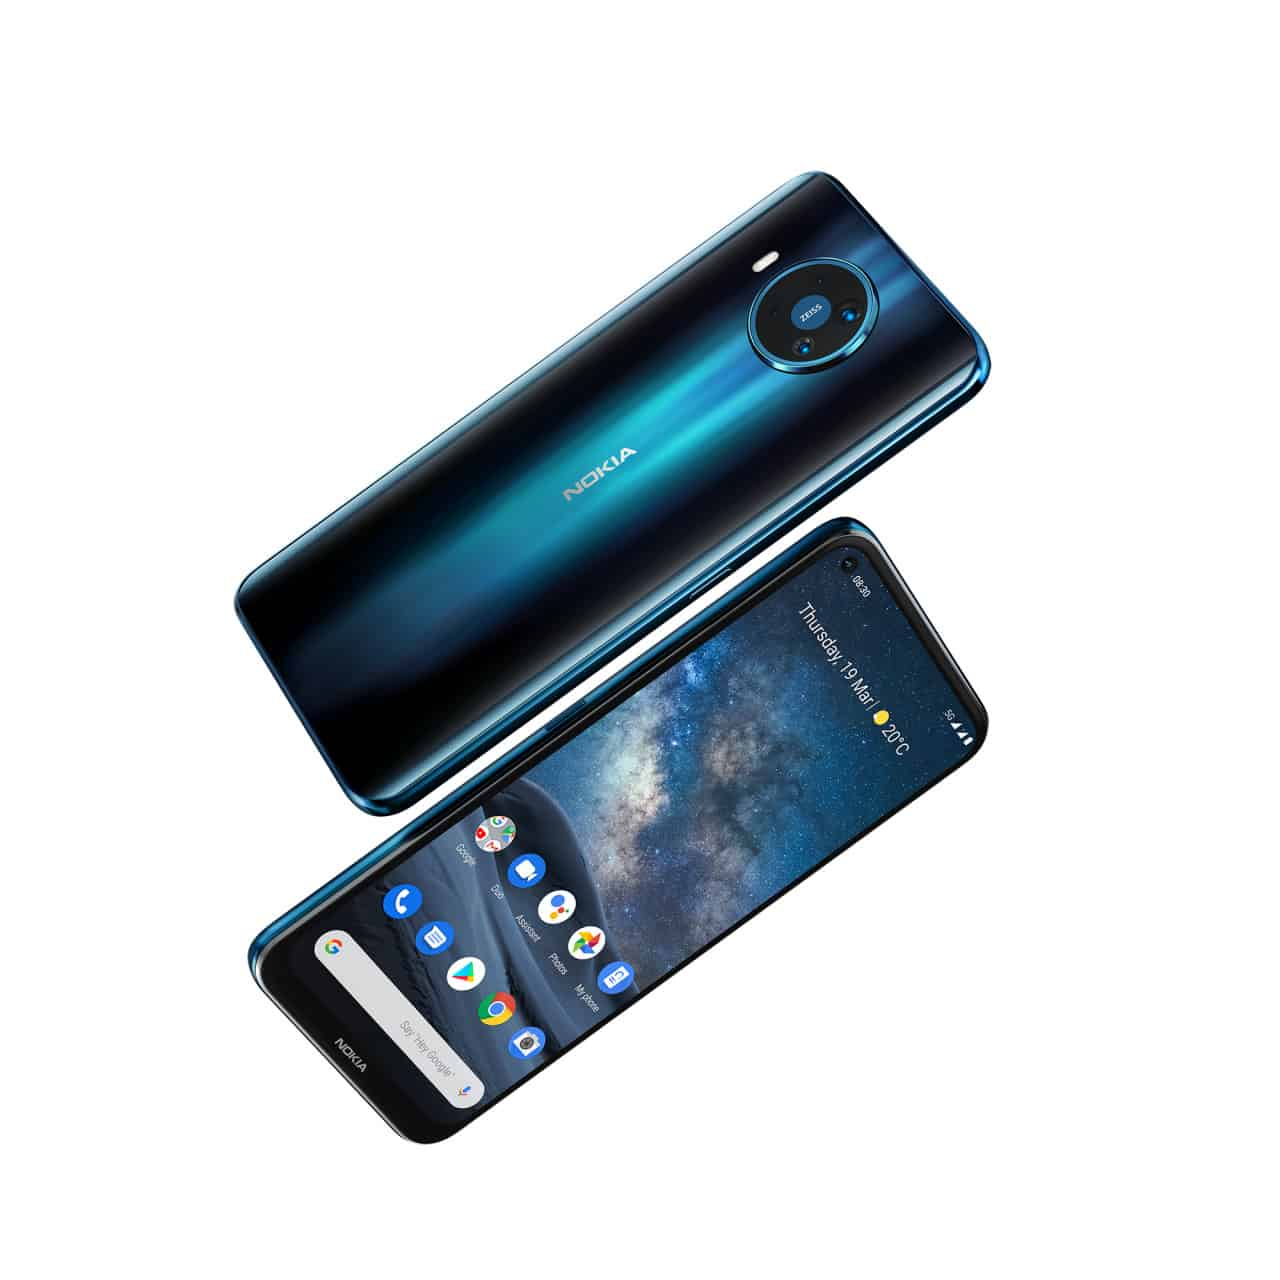 Nokia 8 3 5G image 2